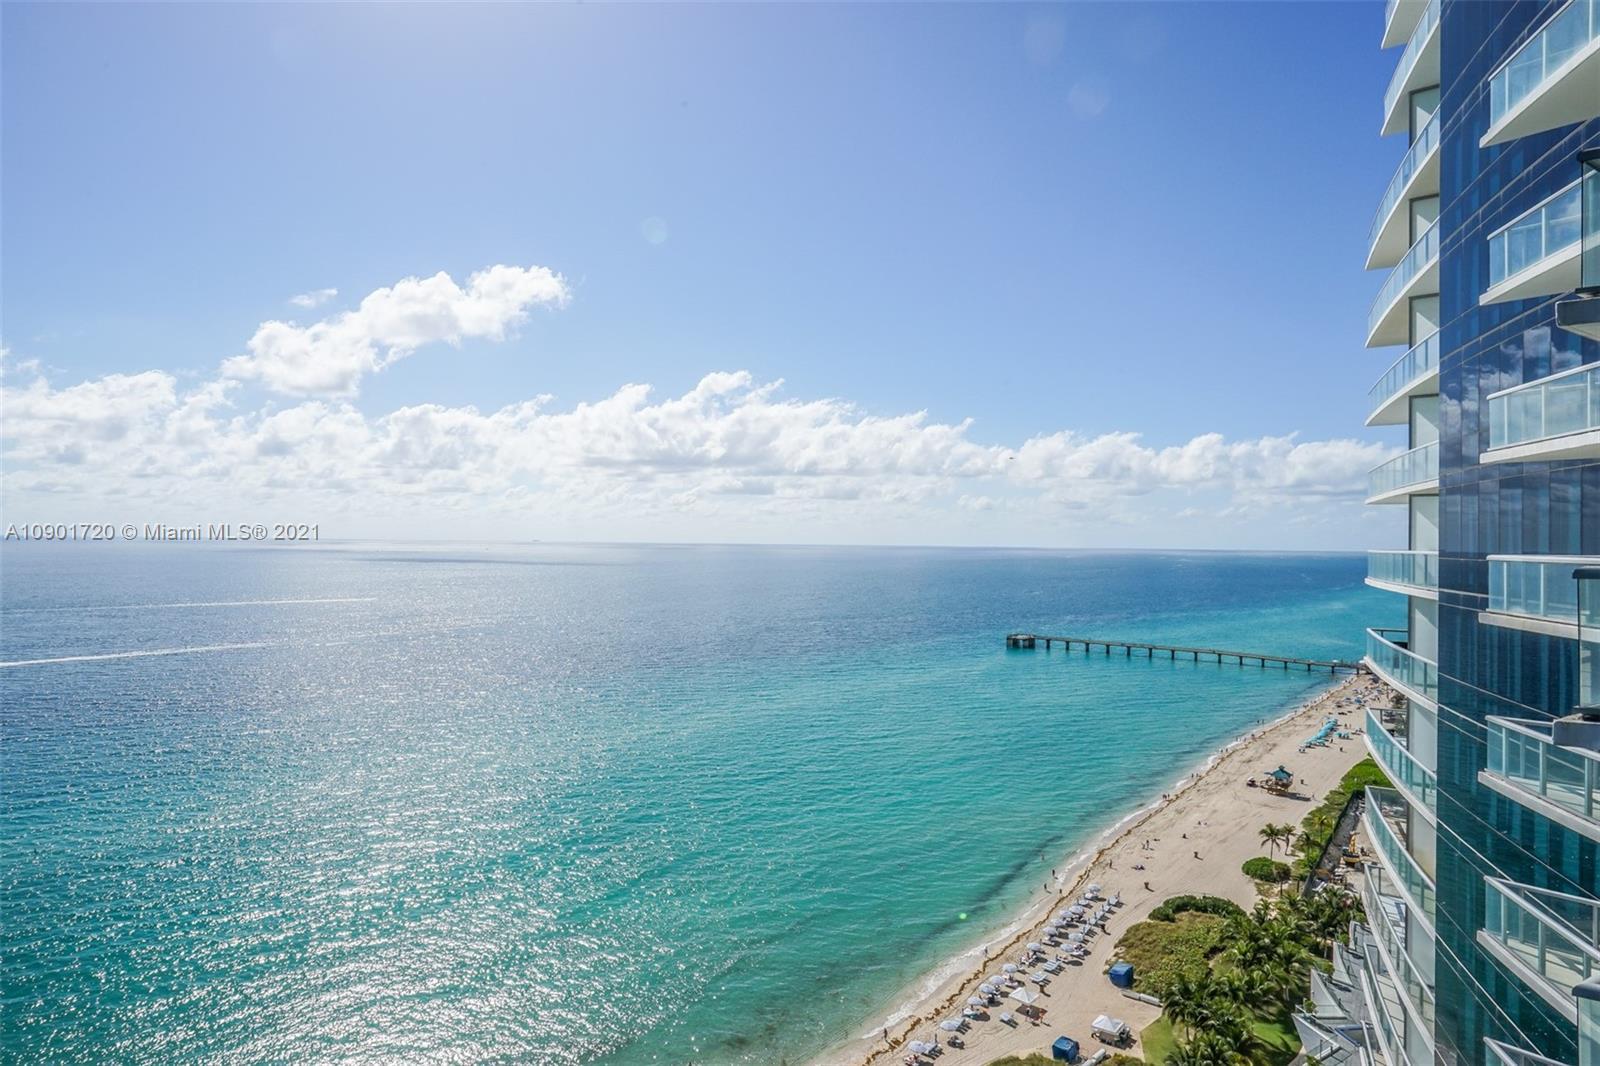 17121 Collins Ave Unit 2206, Sunny Isles Beach, Florida 33160